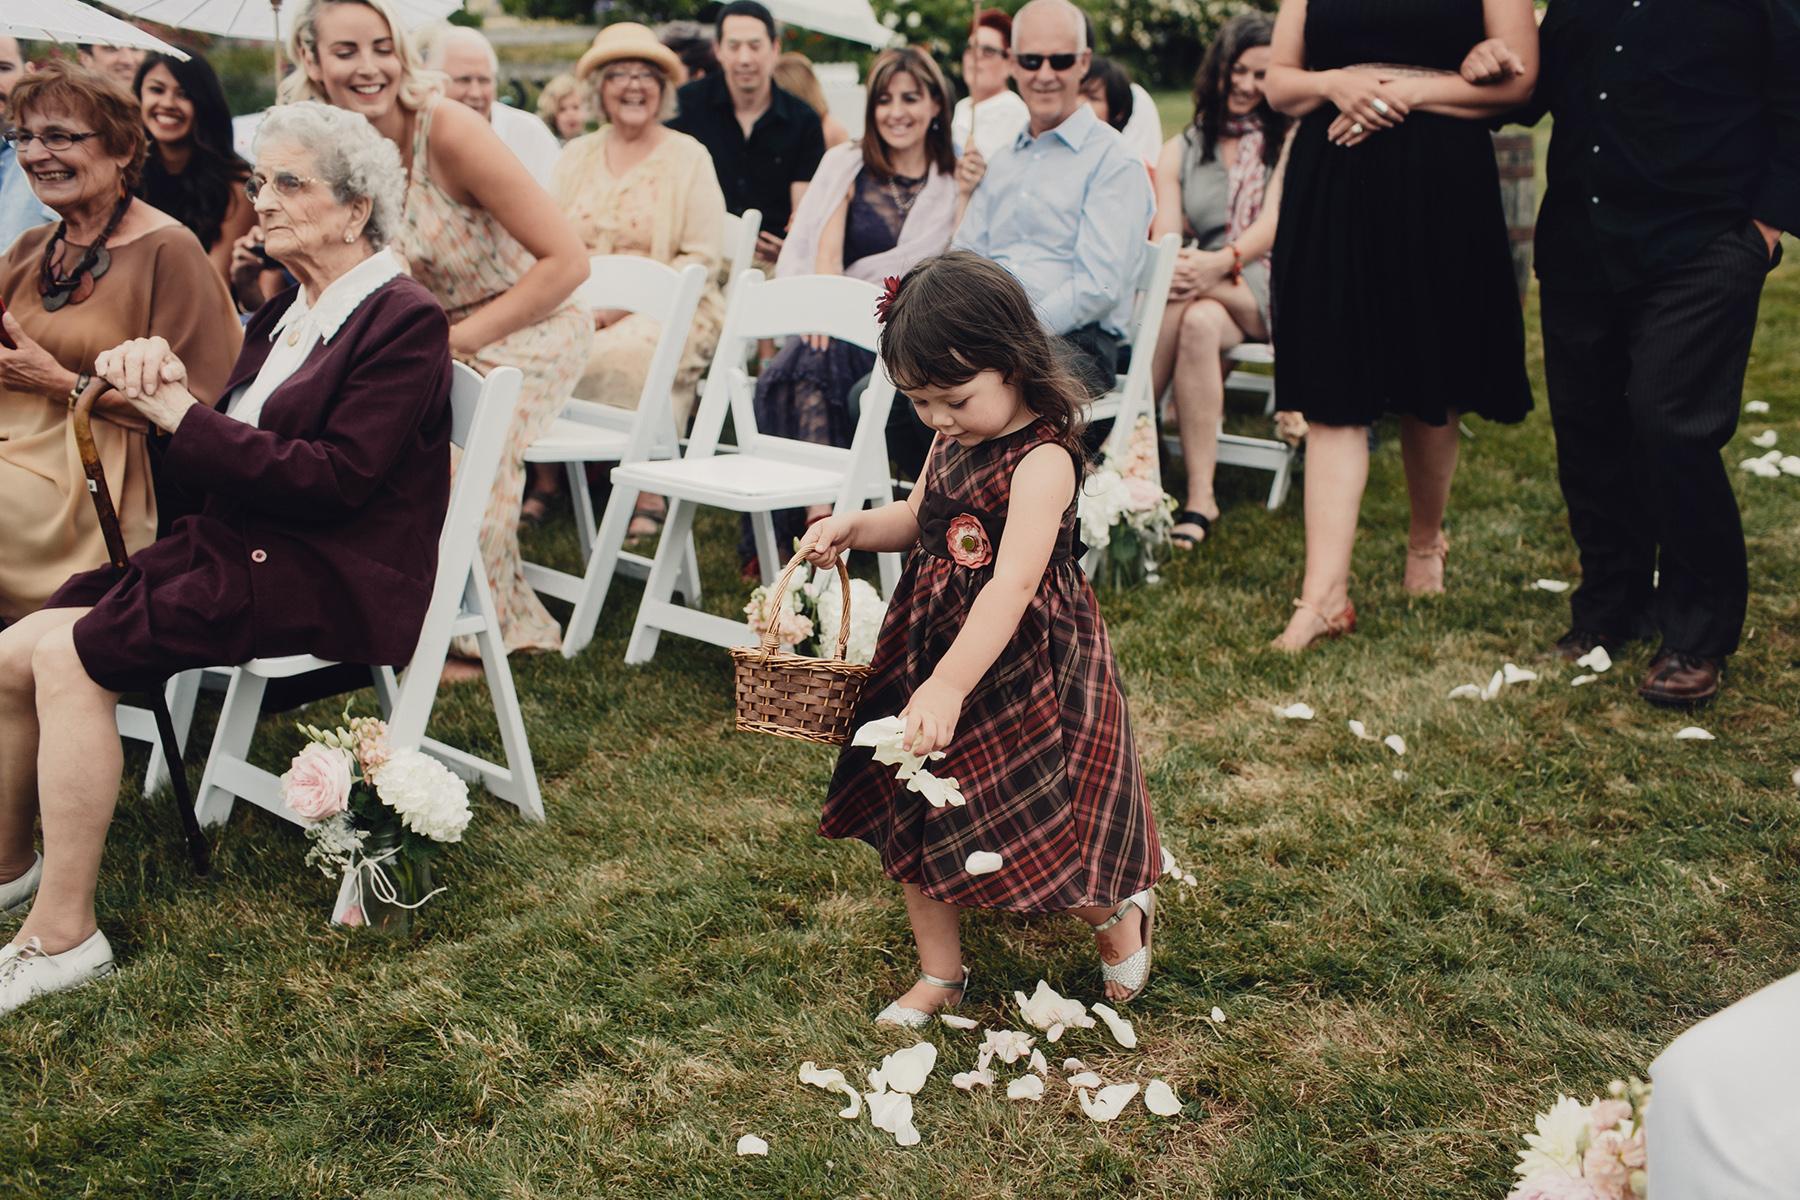 kildara-farms-wedding-photo-inspiration-0030